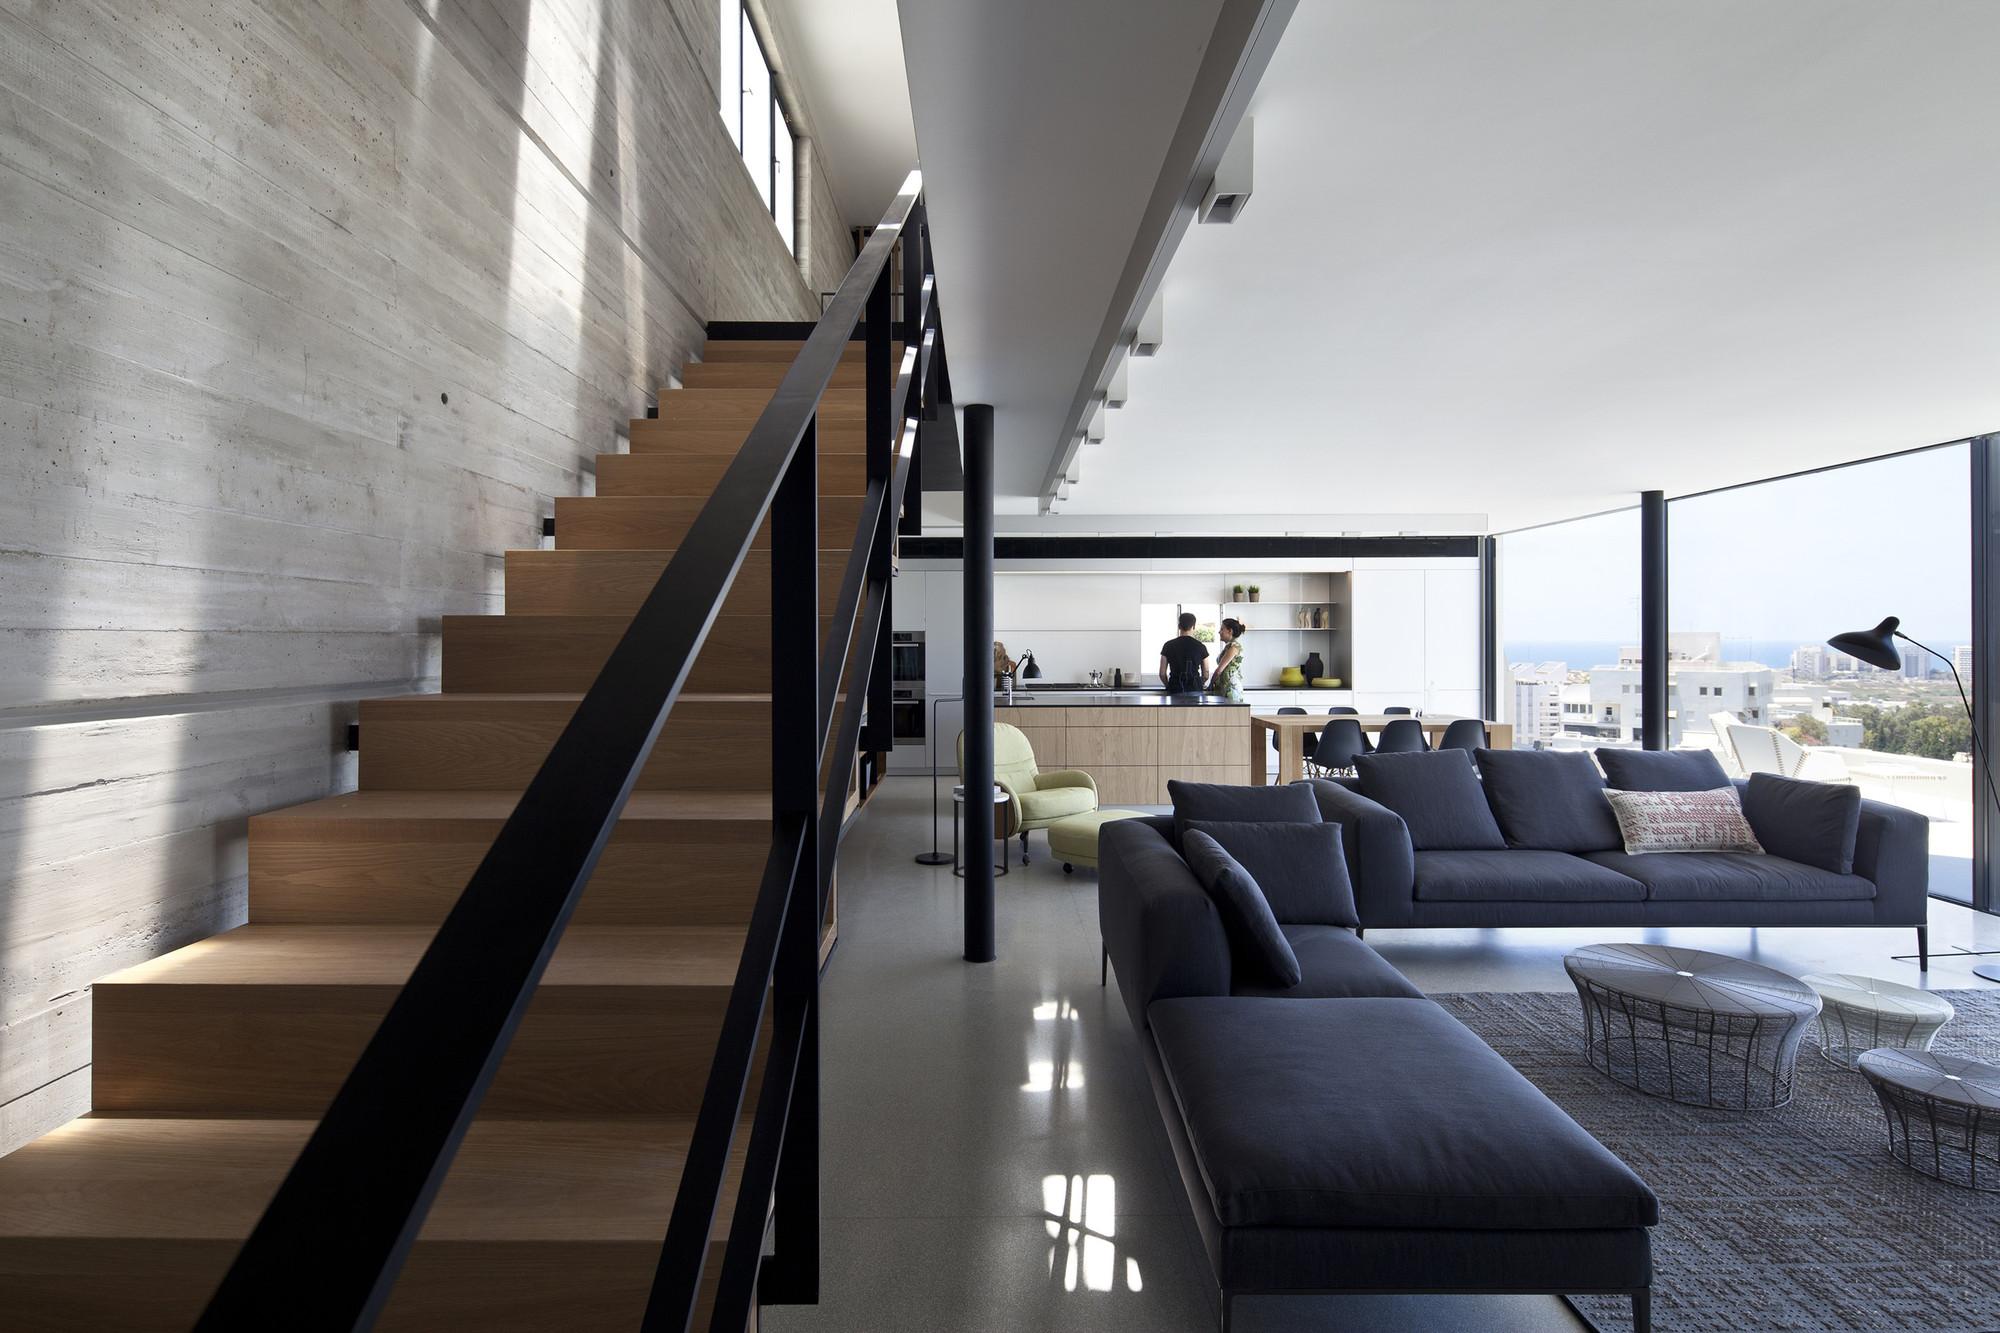 Y Duplex Penthouse / Pitsou Kedem Architects, © Amit Geron